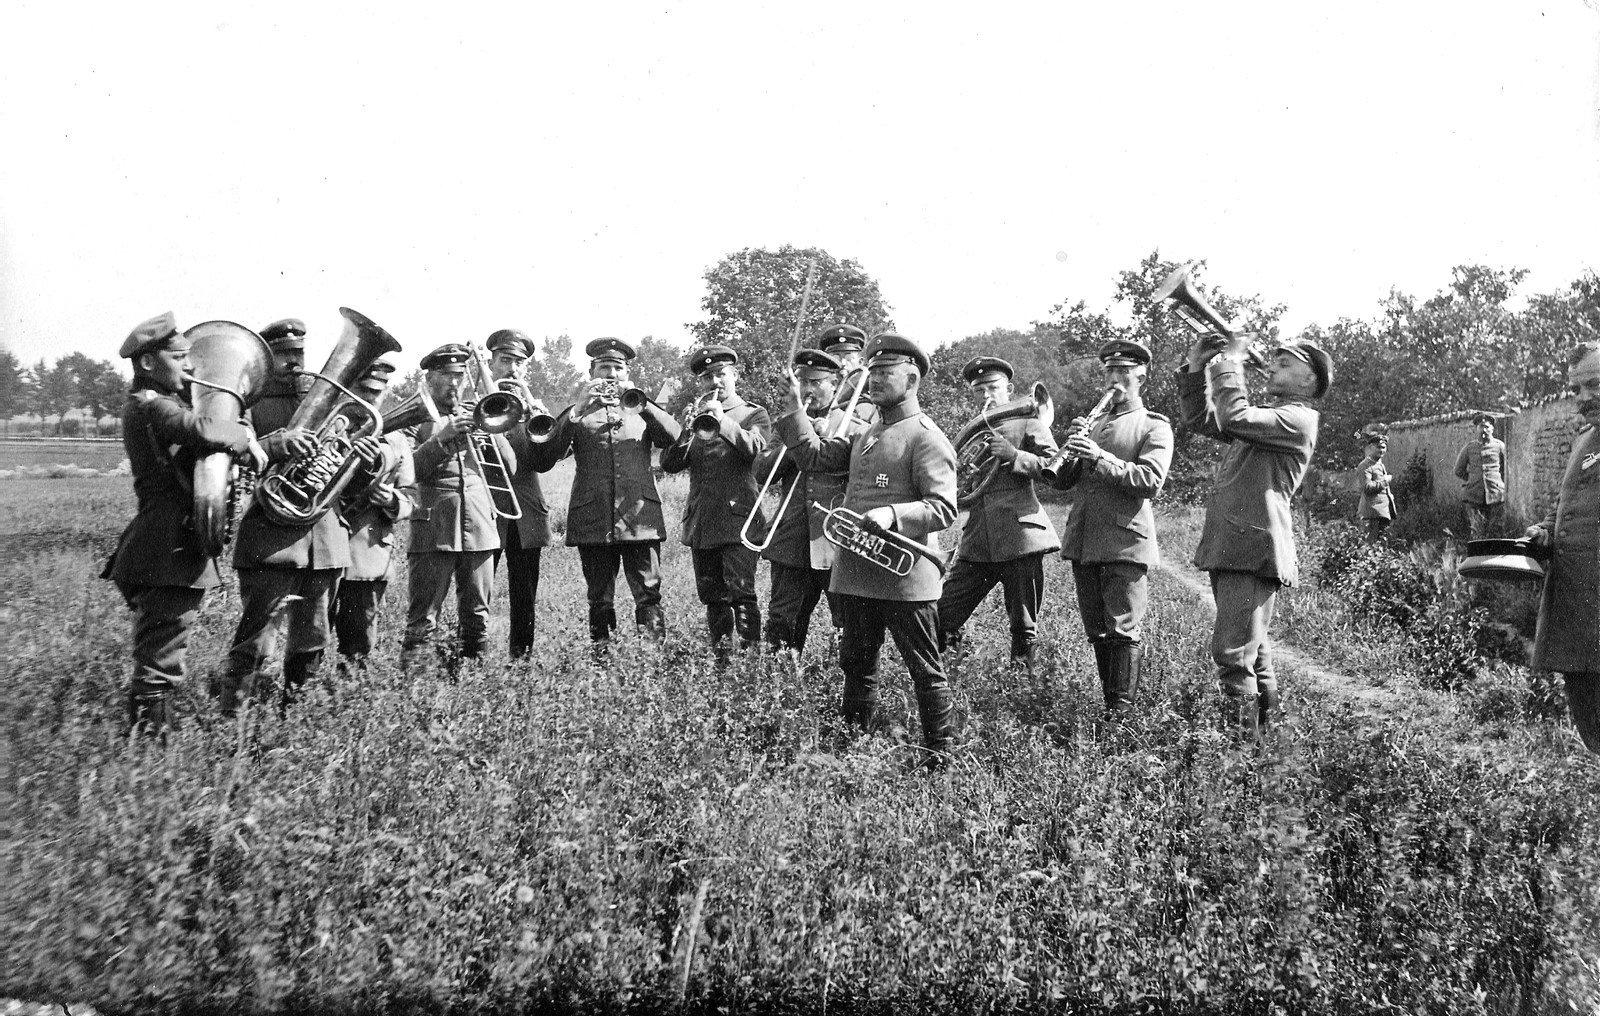 Military band, Lorraine 1915 , photographer unknown, Rolf Kranz / Europeana 1914-1918, CC BY-SA